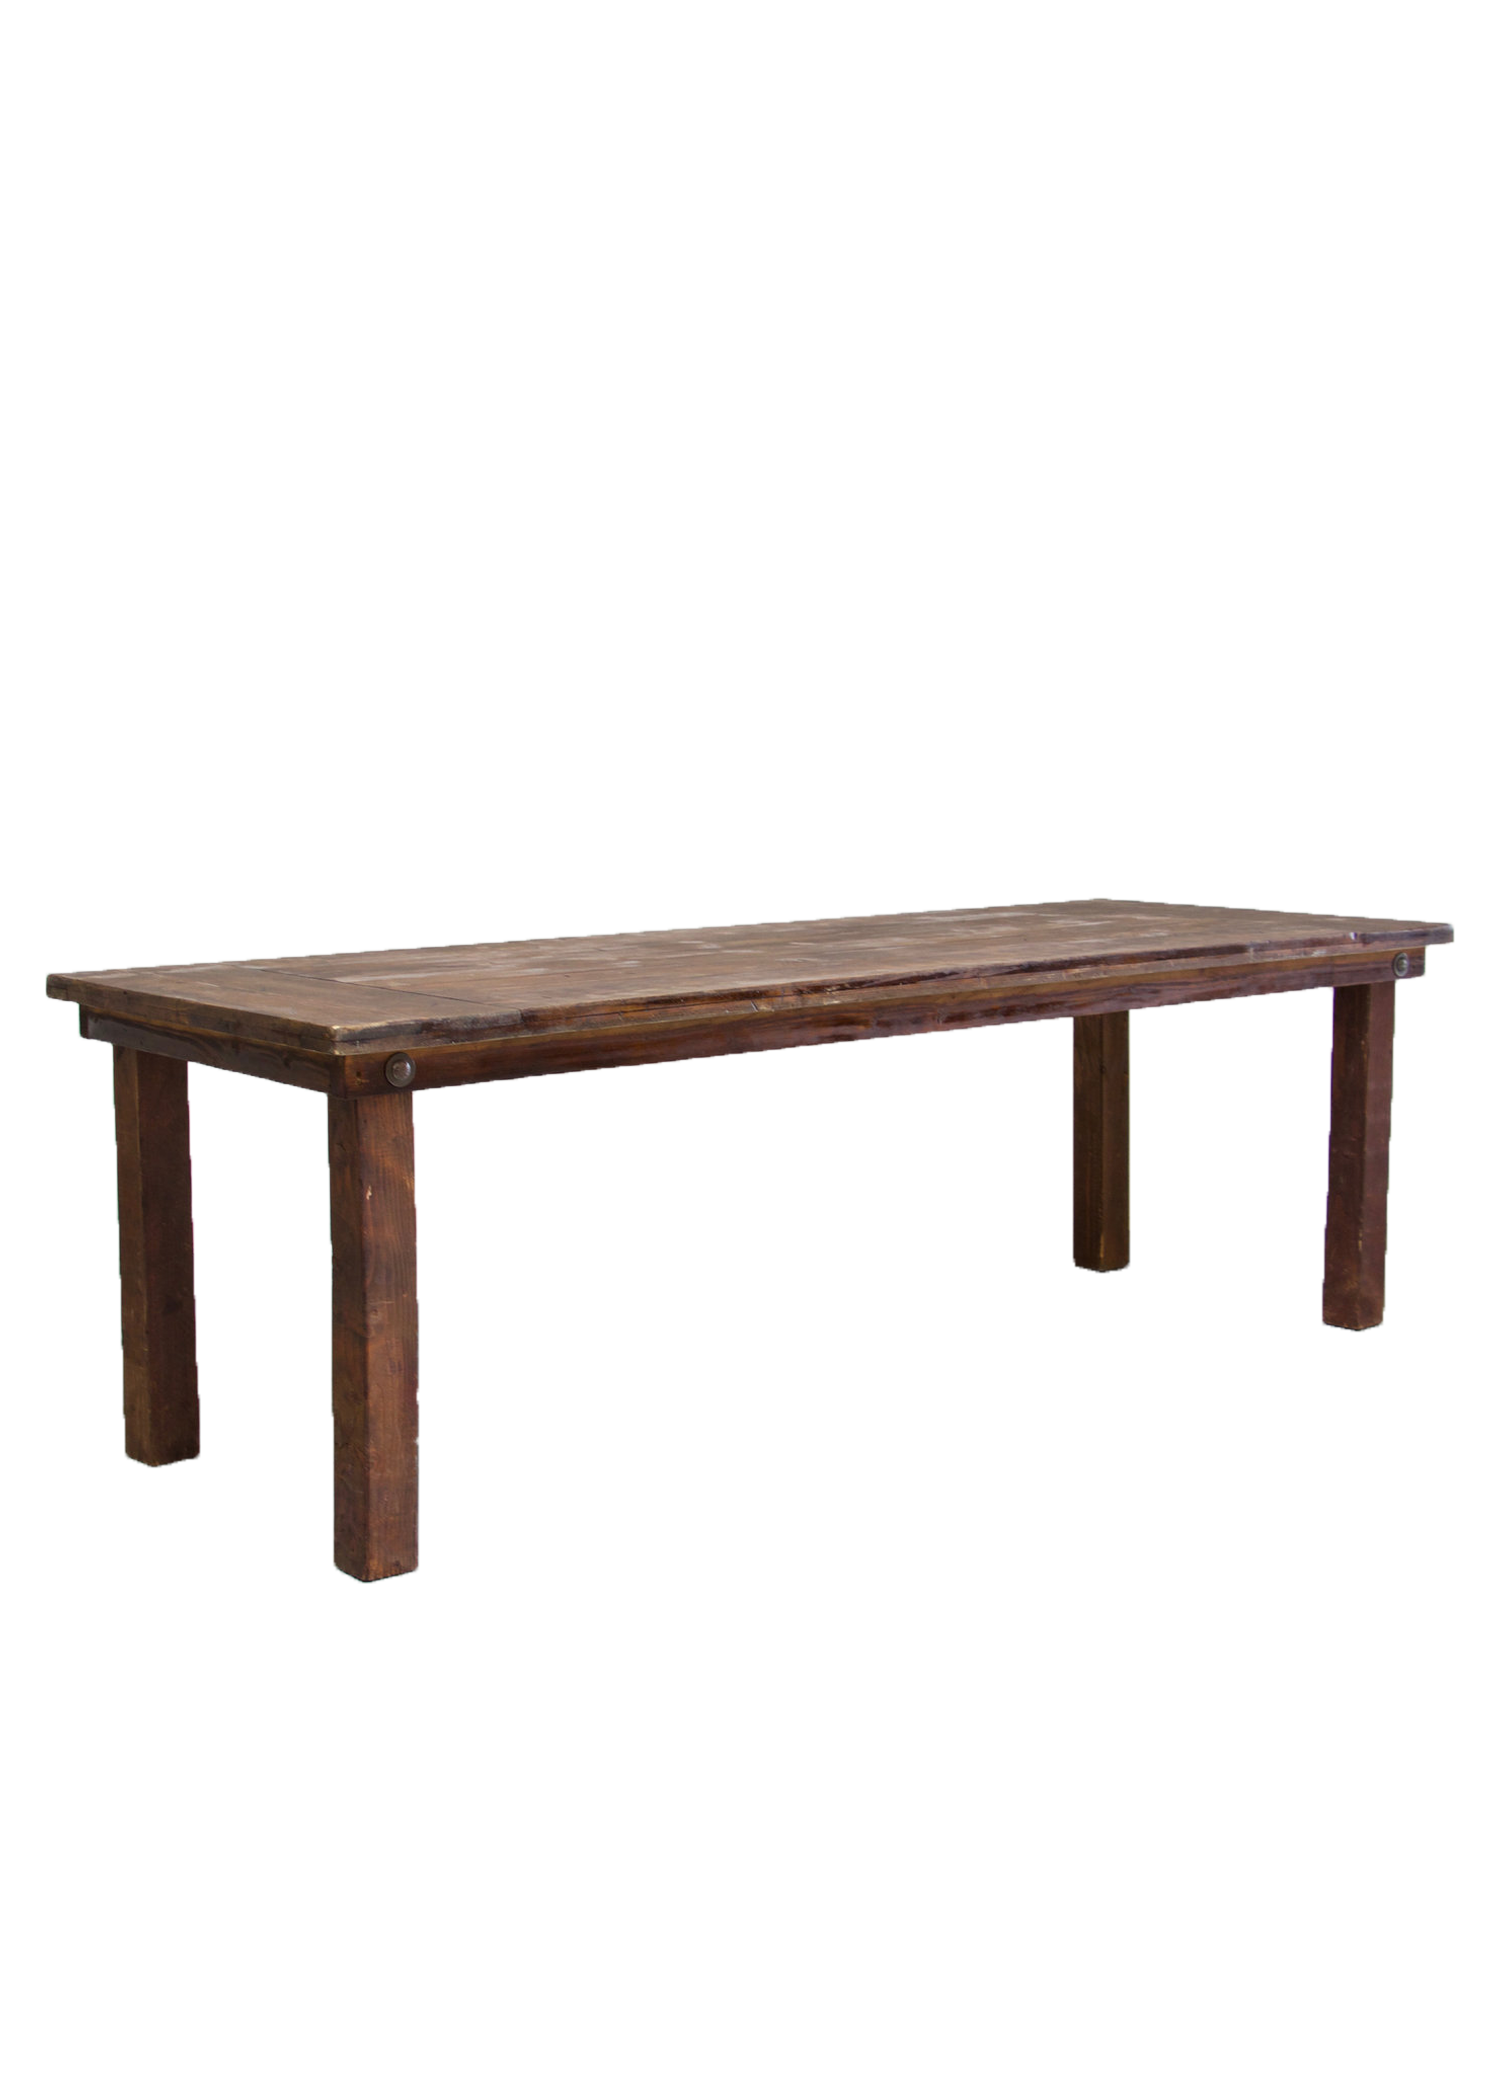 $85 Mahogany Rectangular Dinner Table